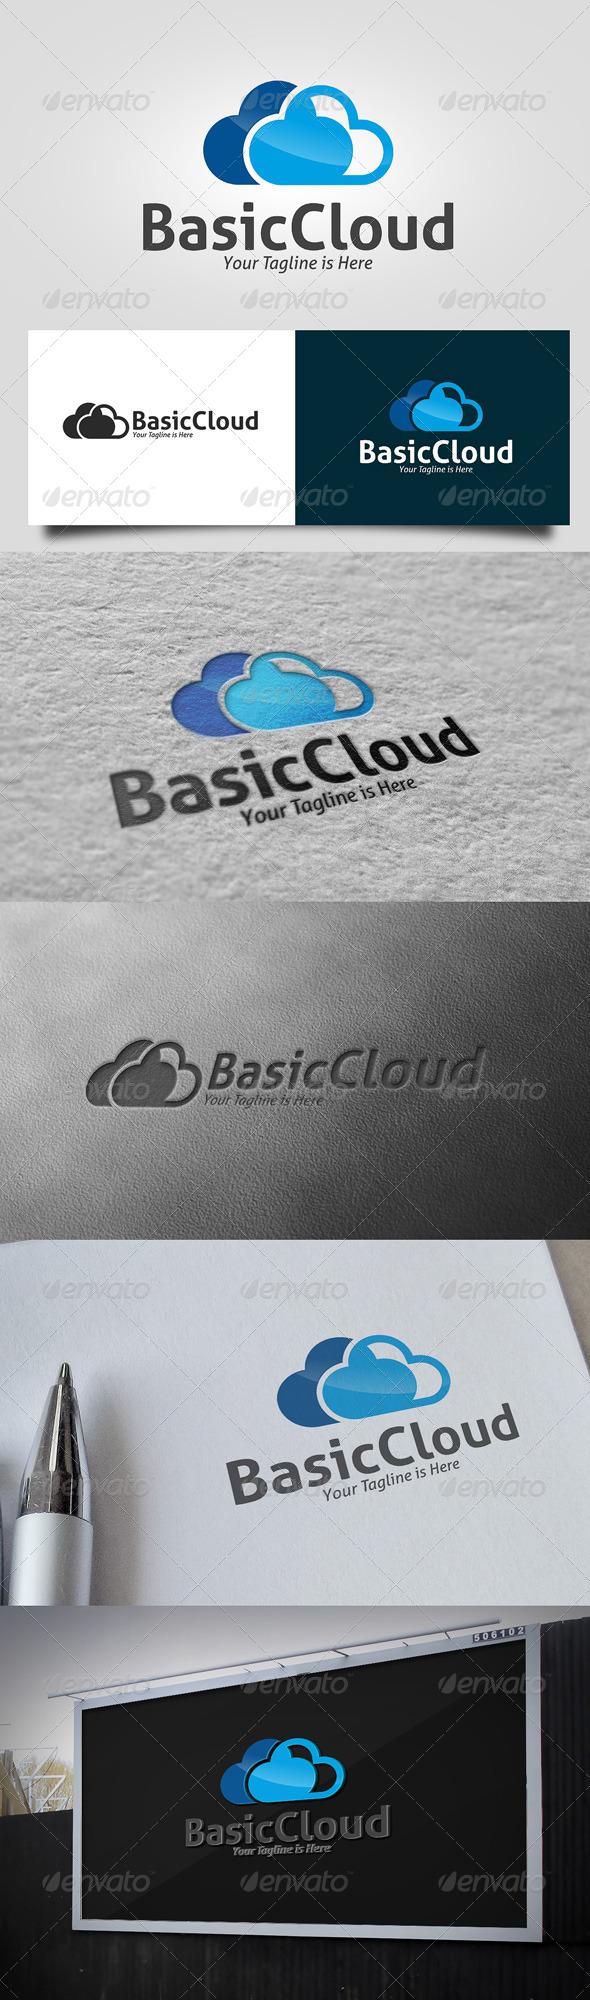 GraphicRiver Basic Cloud Logo 5709823